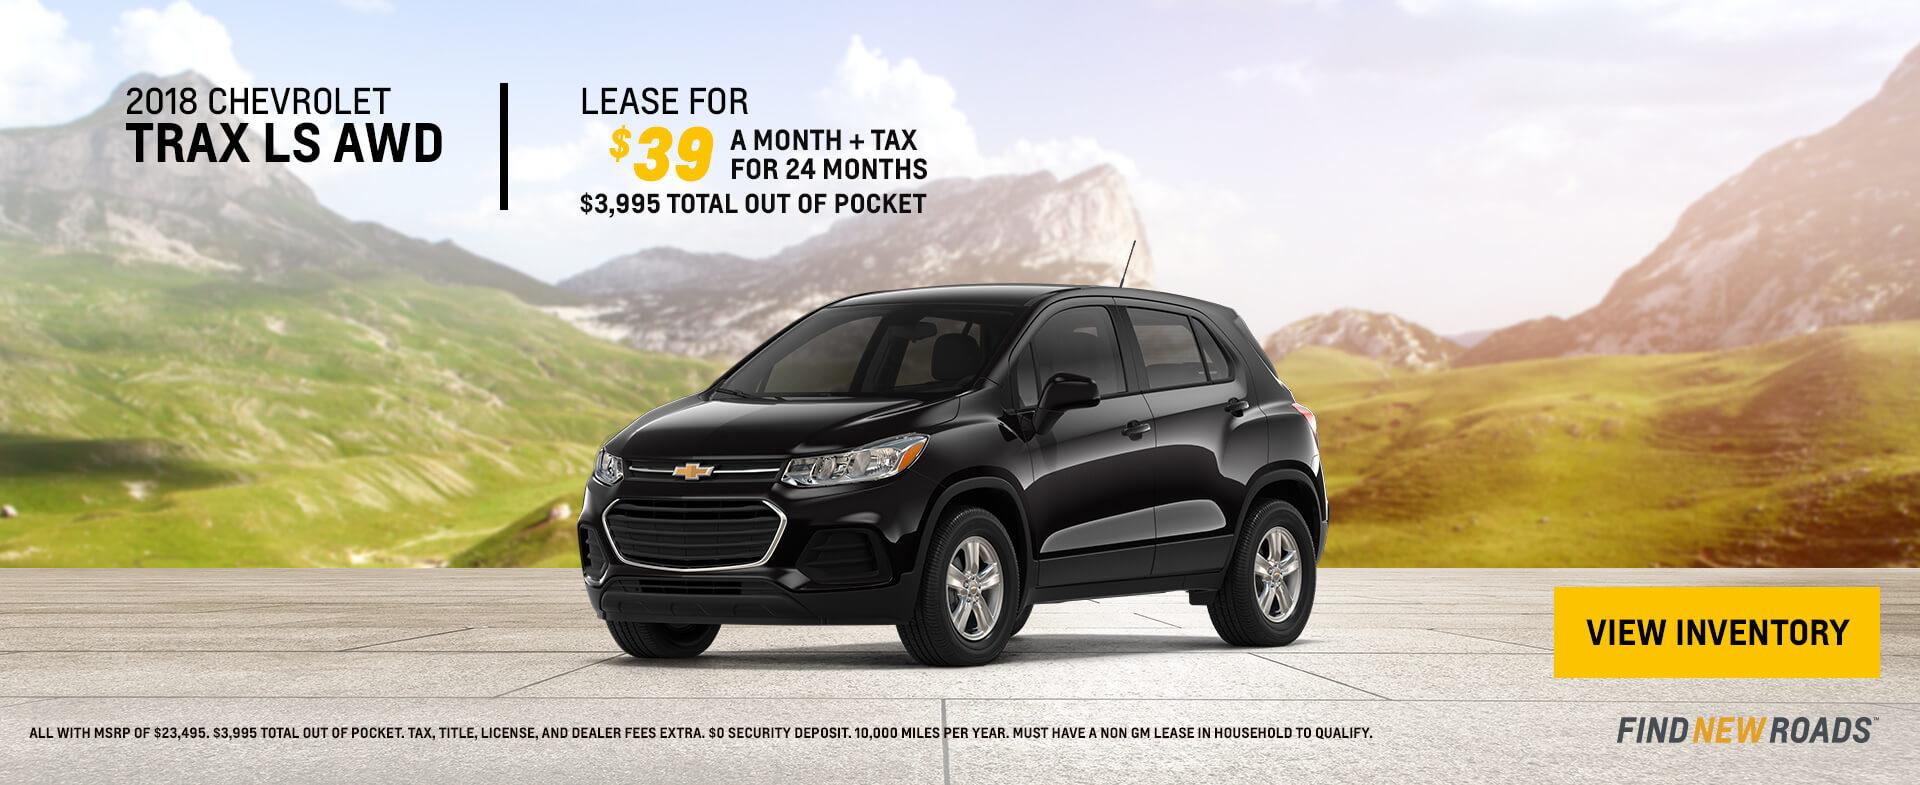 2018 Chevrolet Trax $39